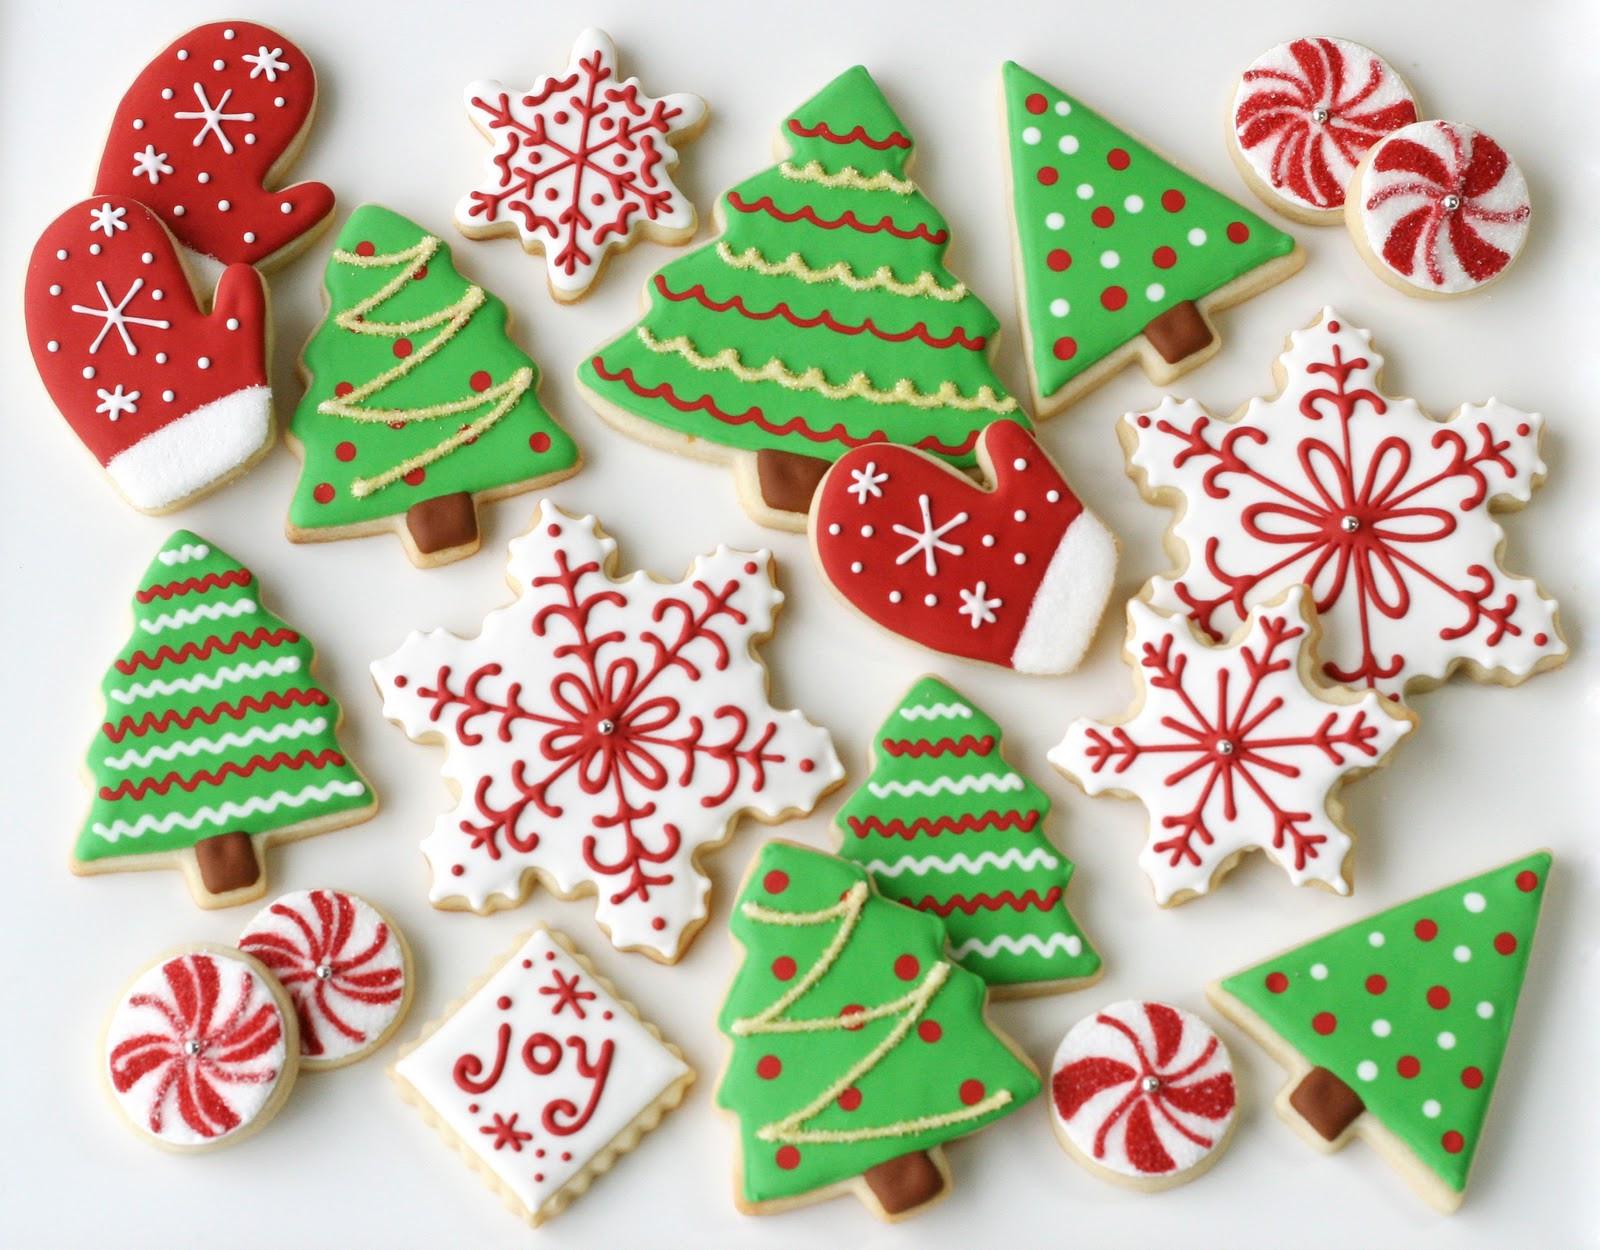 Christmas Cookie Icing Recipe  Christmas Cookies Galore Glorious Treats